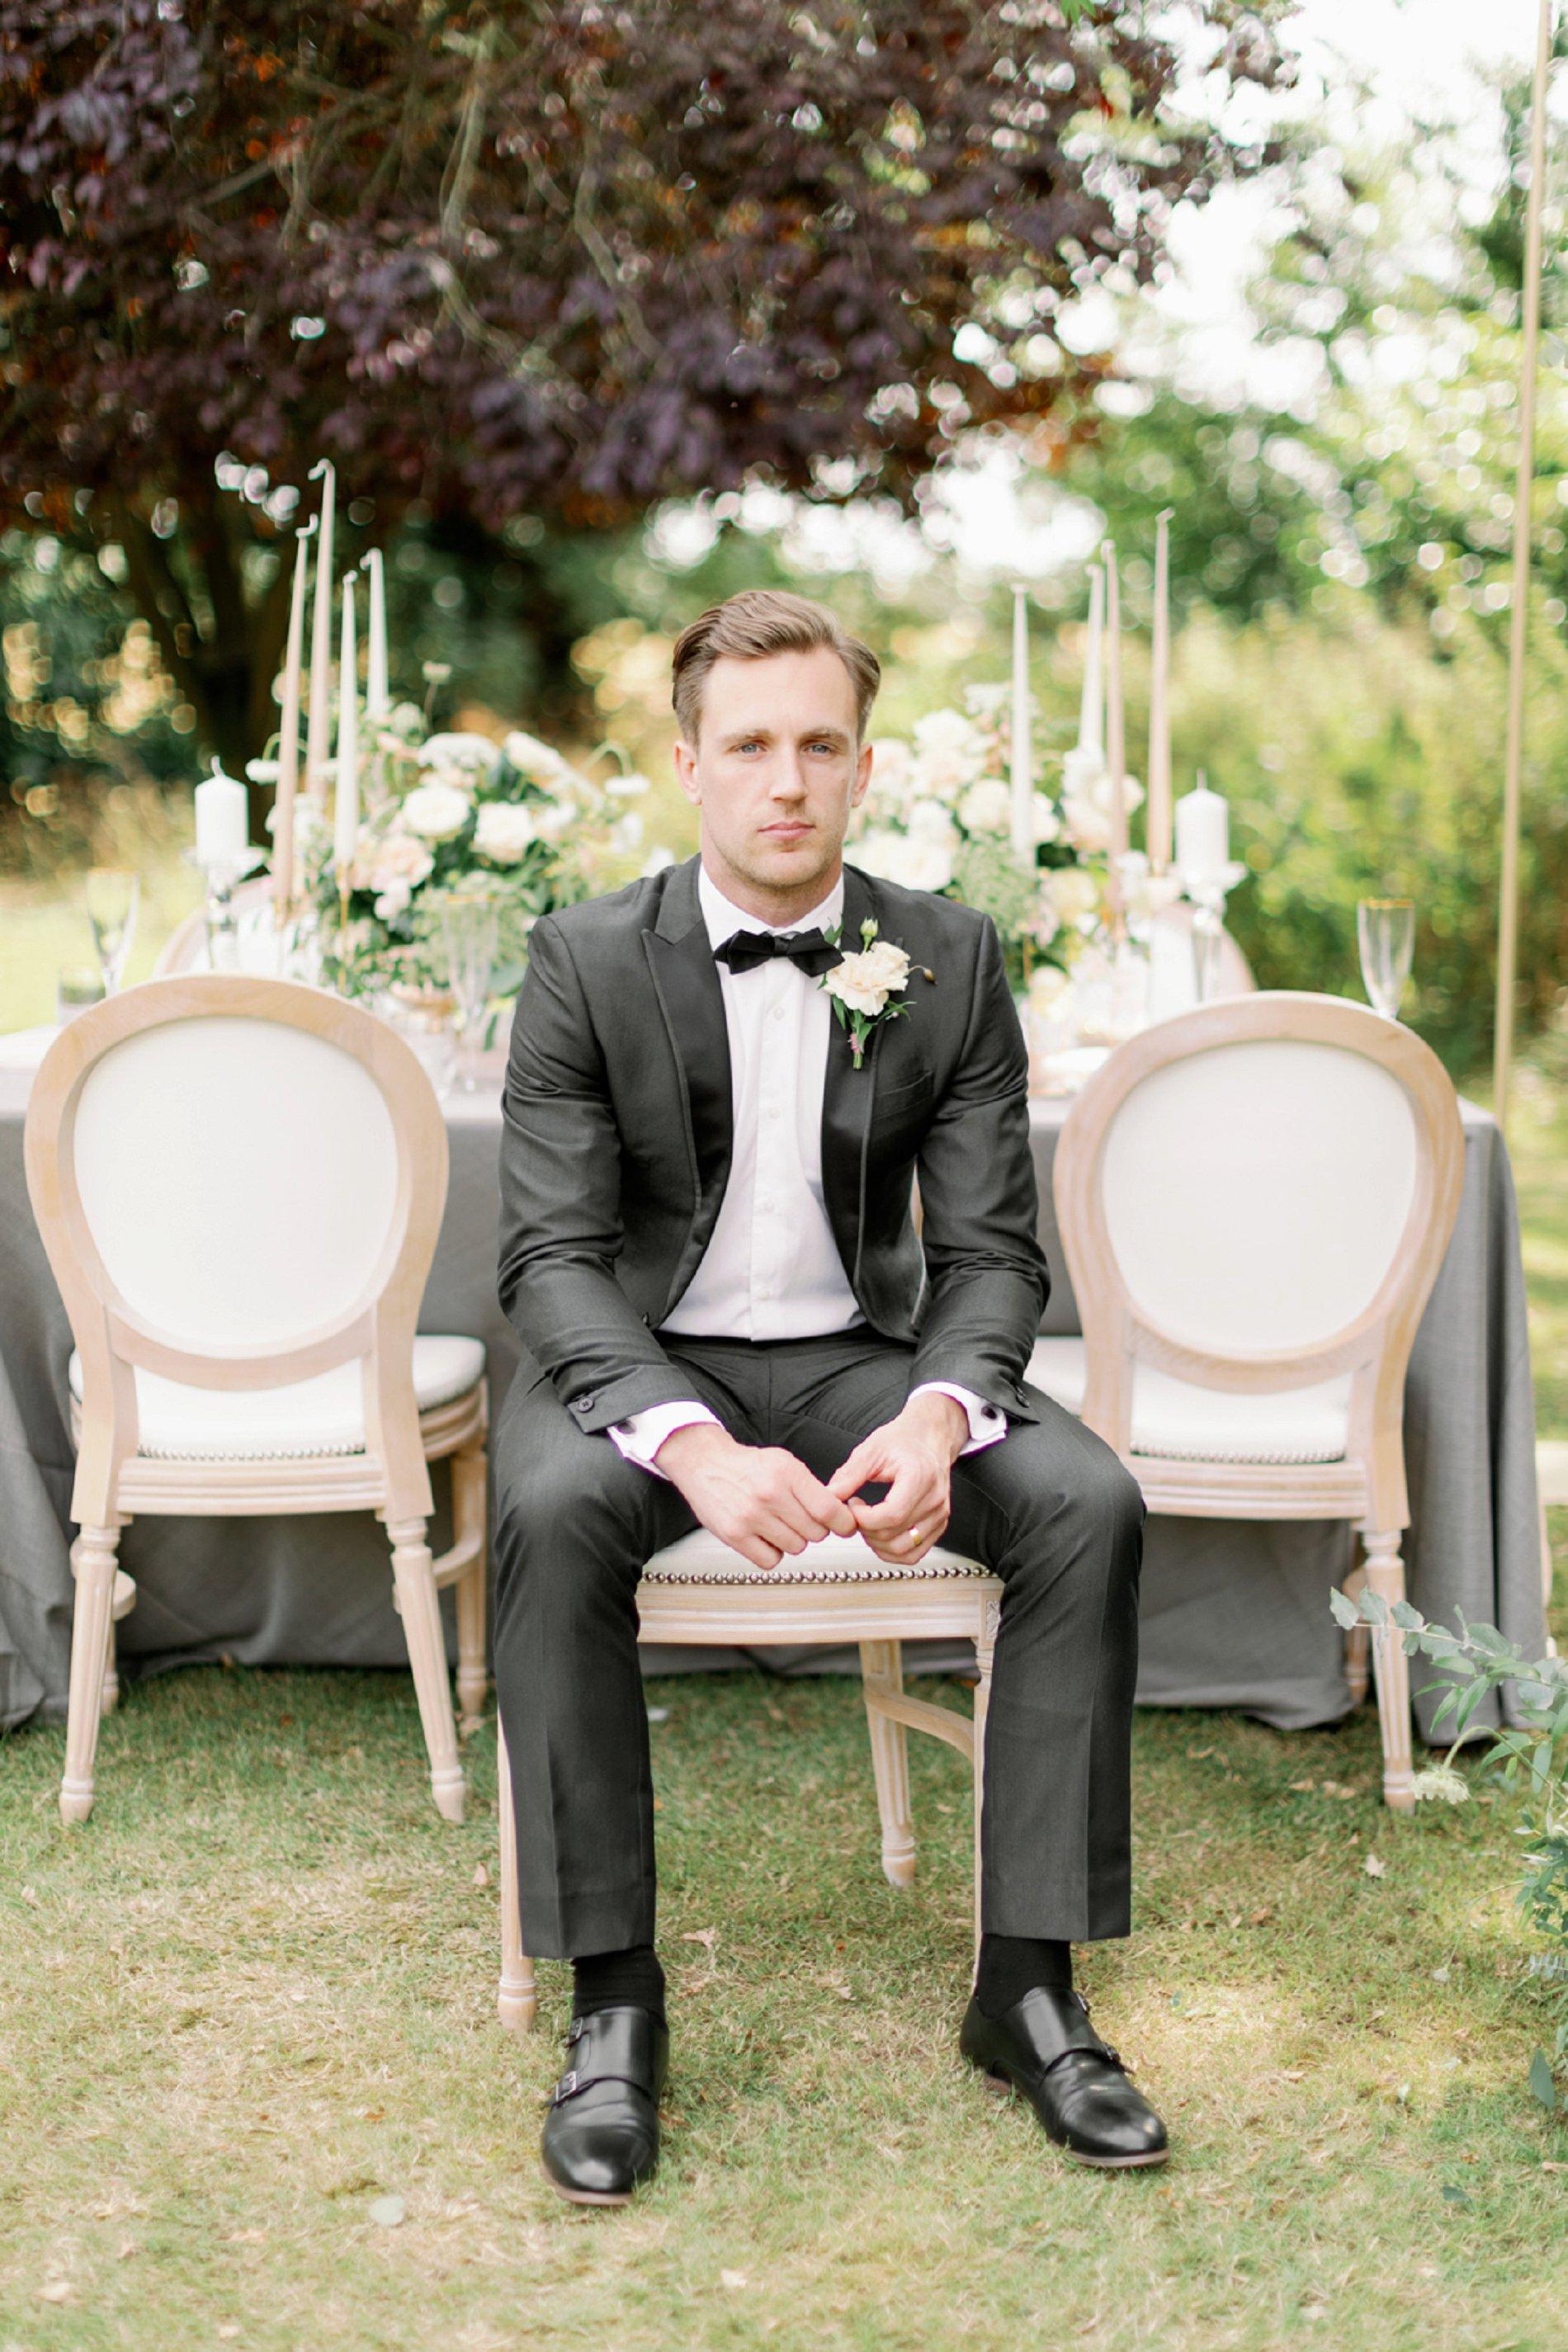 An Elegant Styled Shoot at Baddow Park House (c) Camilla J Hards (24)